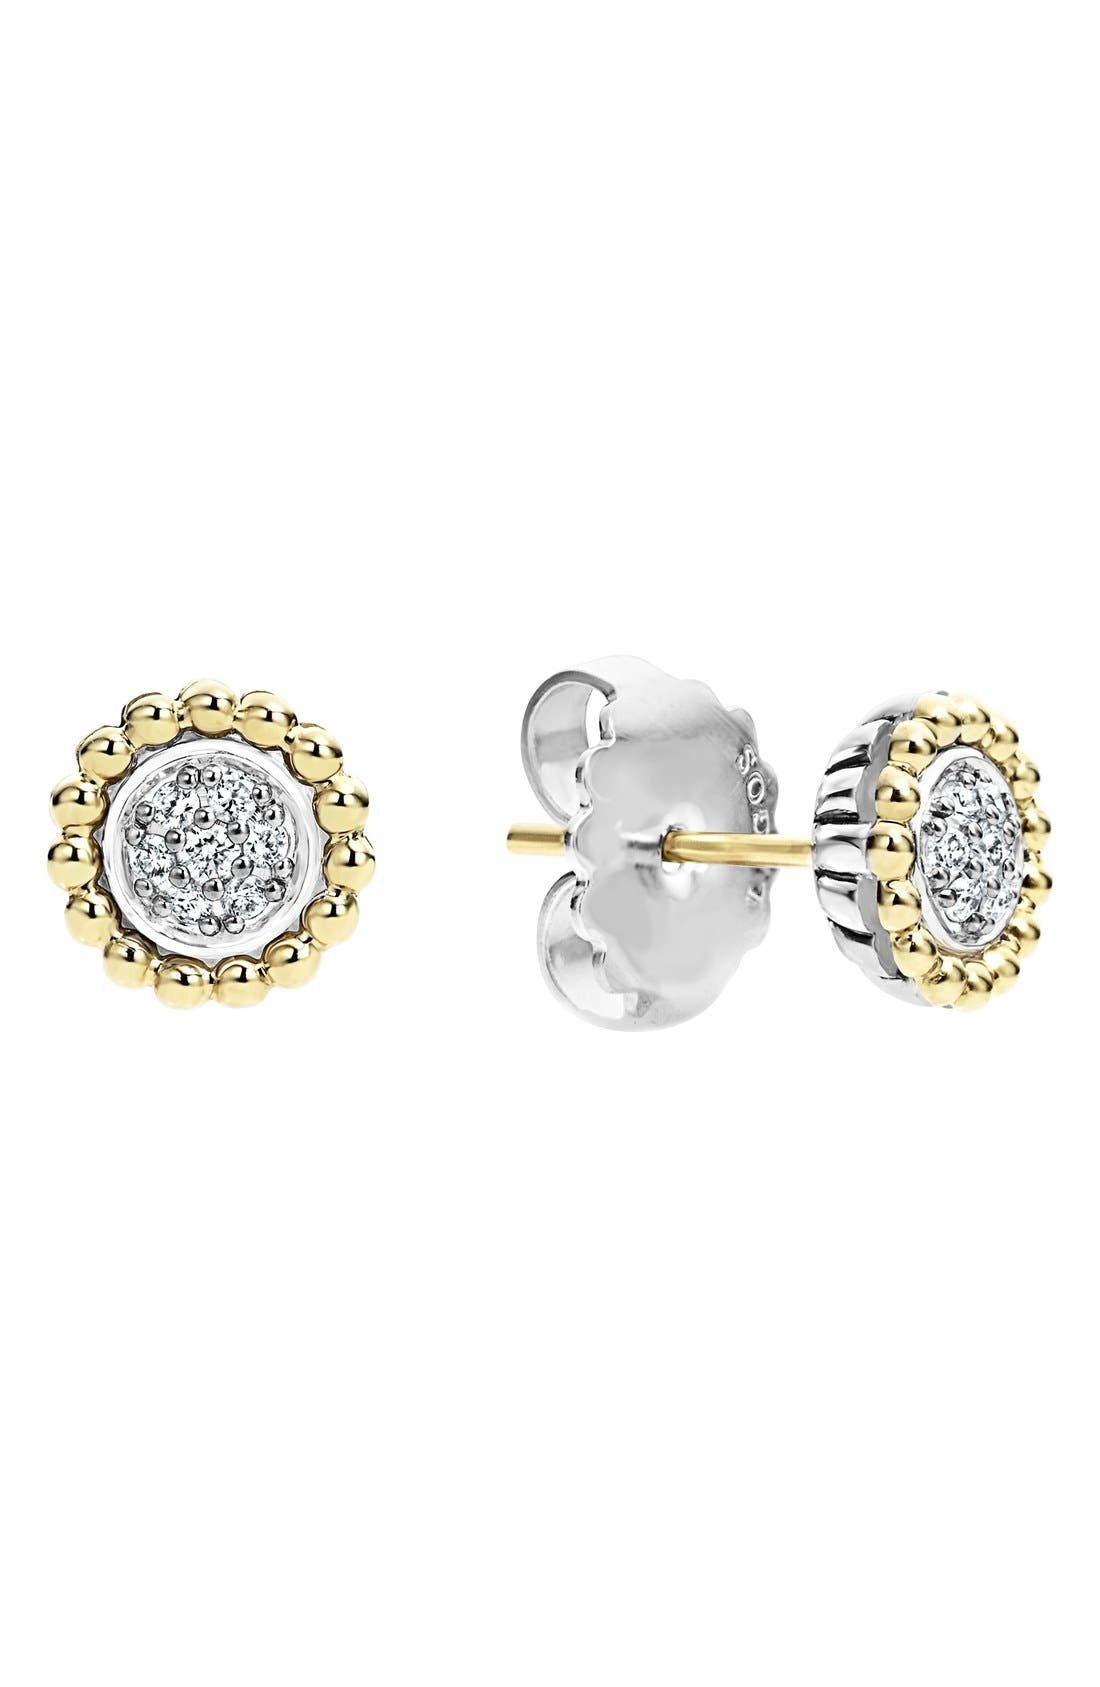 Diamond Caviar Stud Earrings,                             Alternate thumbnail 2, color,                             SILVER/ GOLD